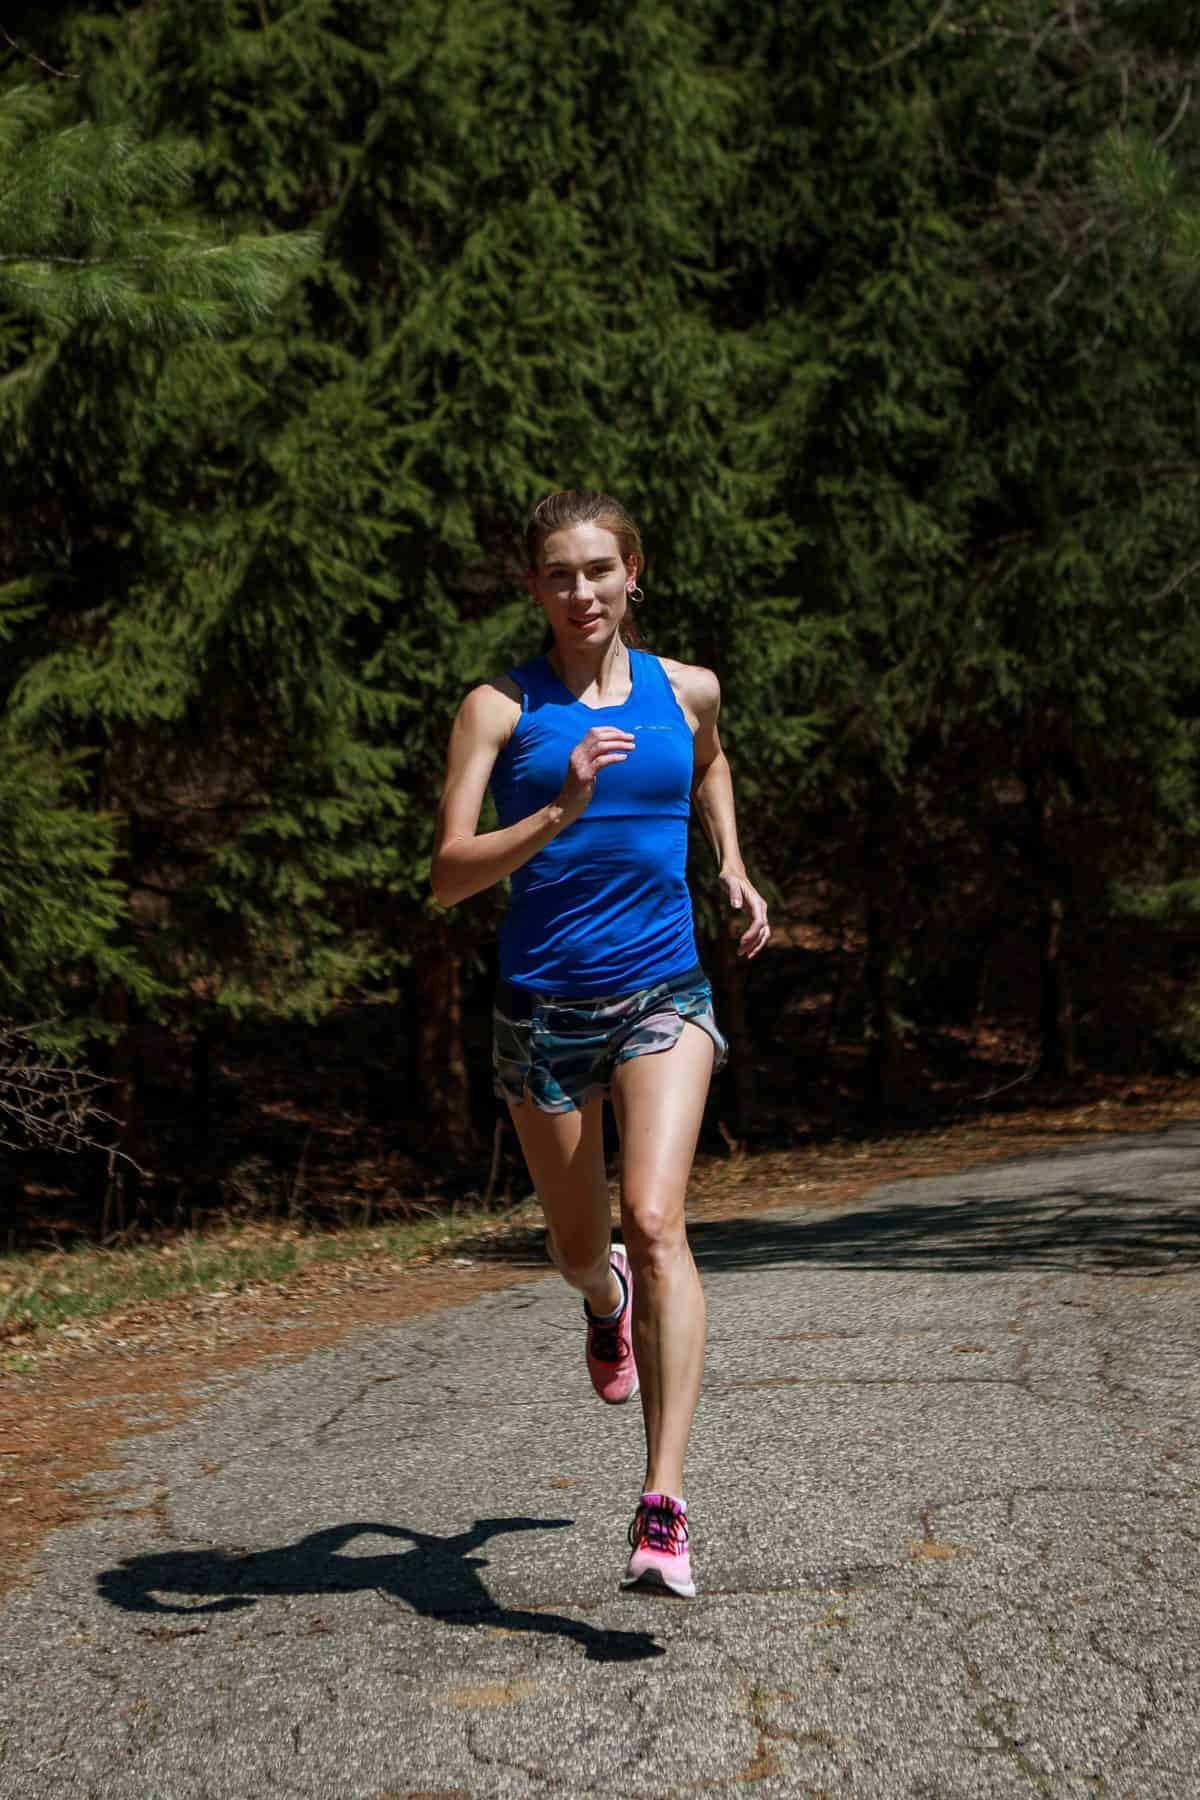 Adi, from AtoZrunning, running fast!